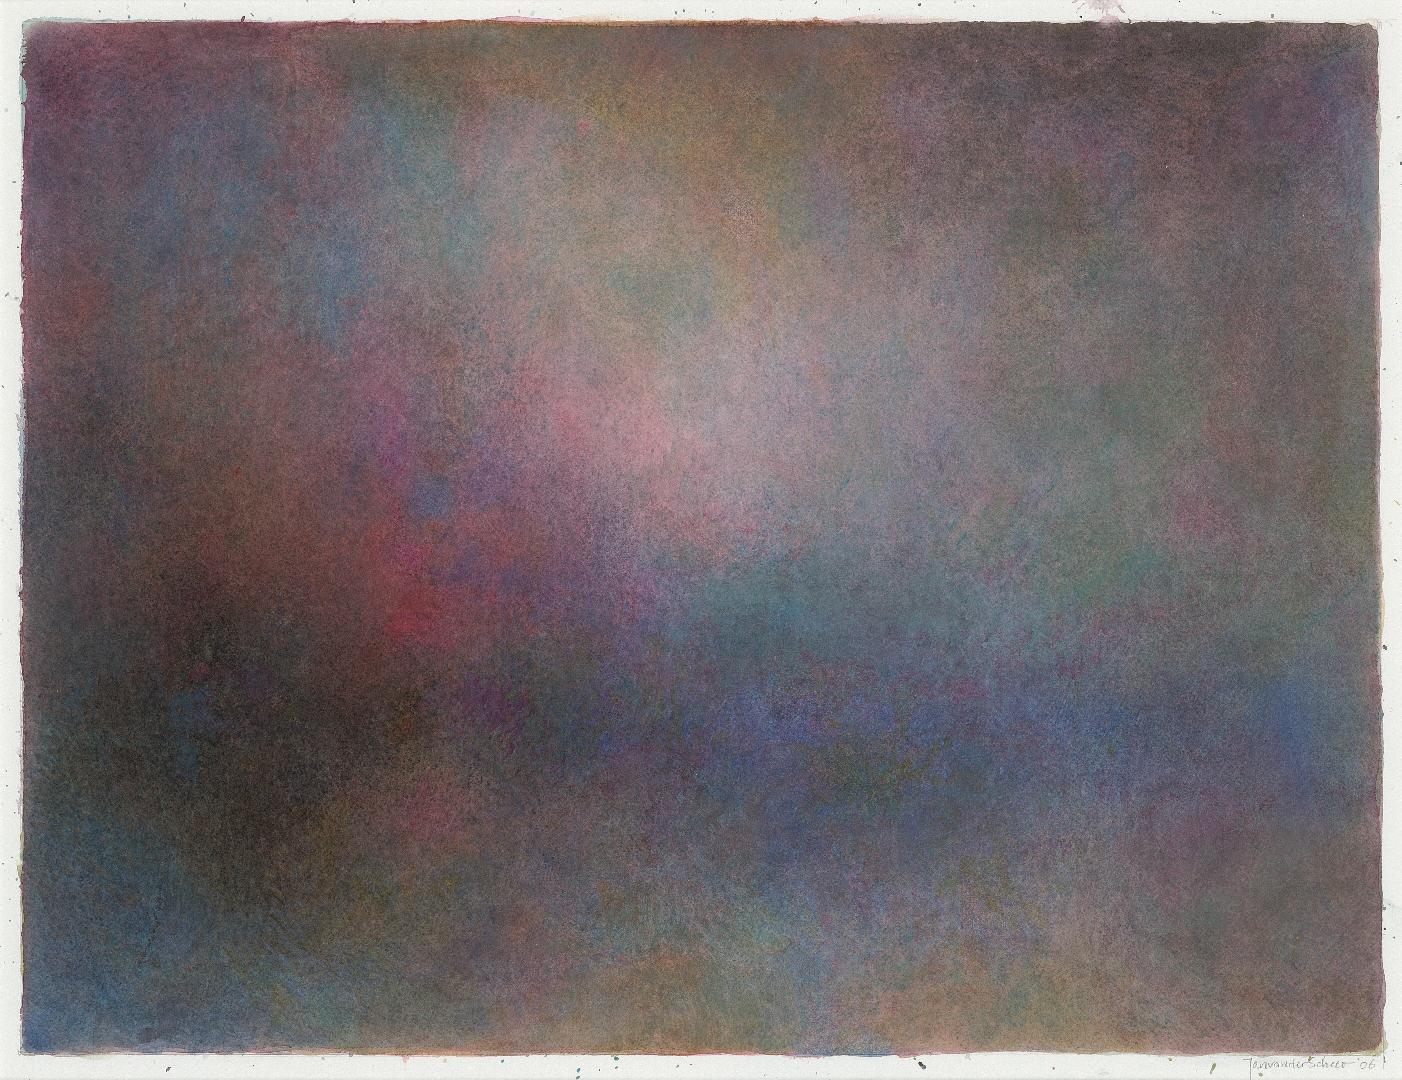 2006 Herfst (47 X 61 cm) 9846w